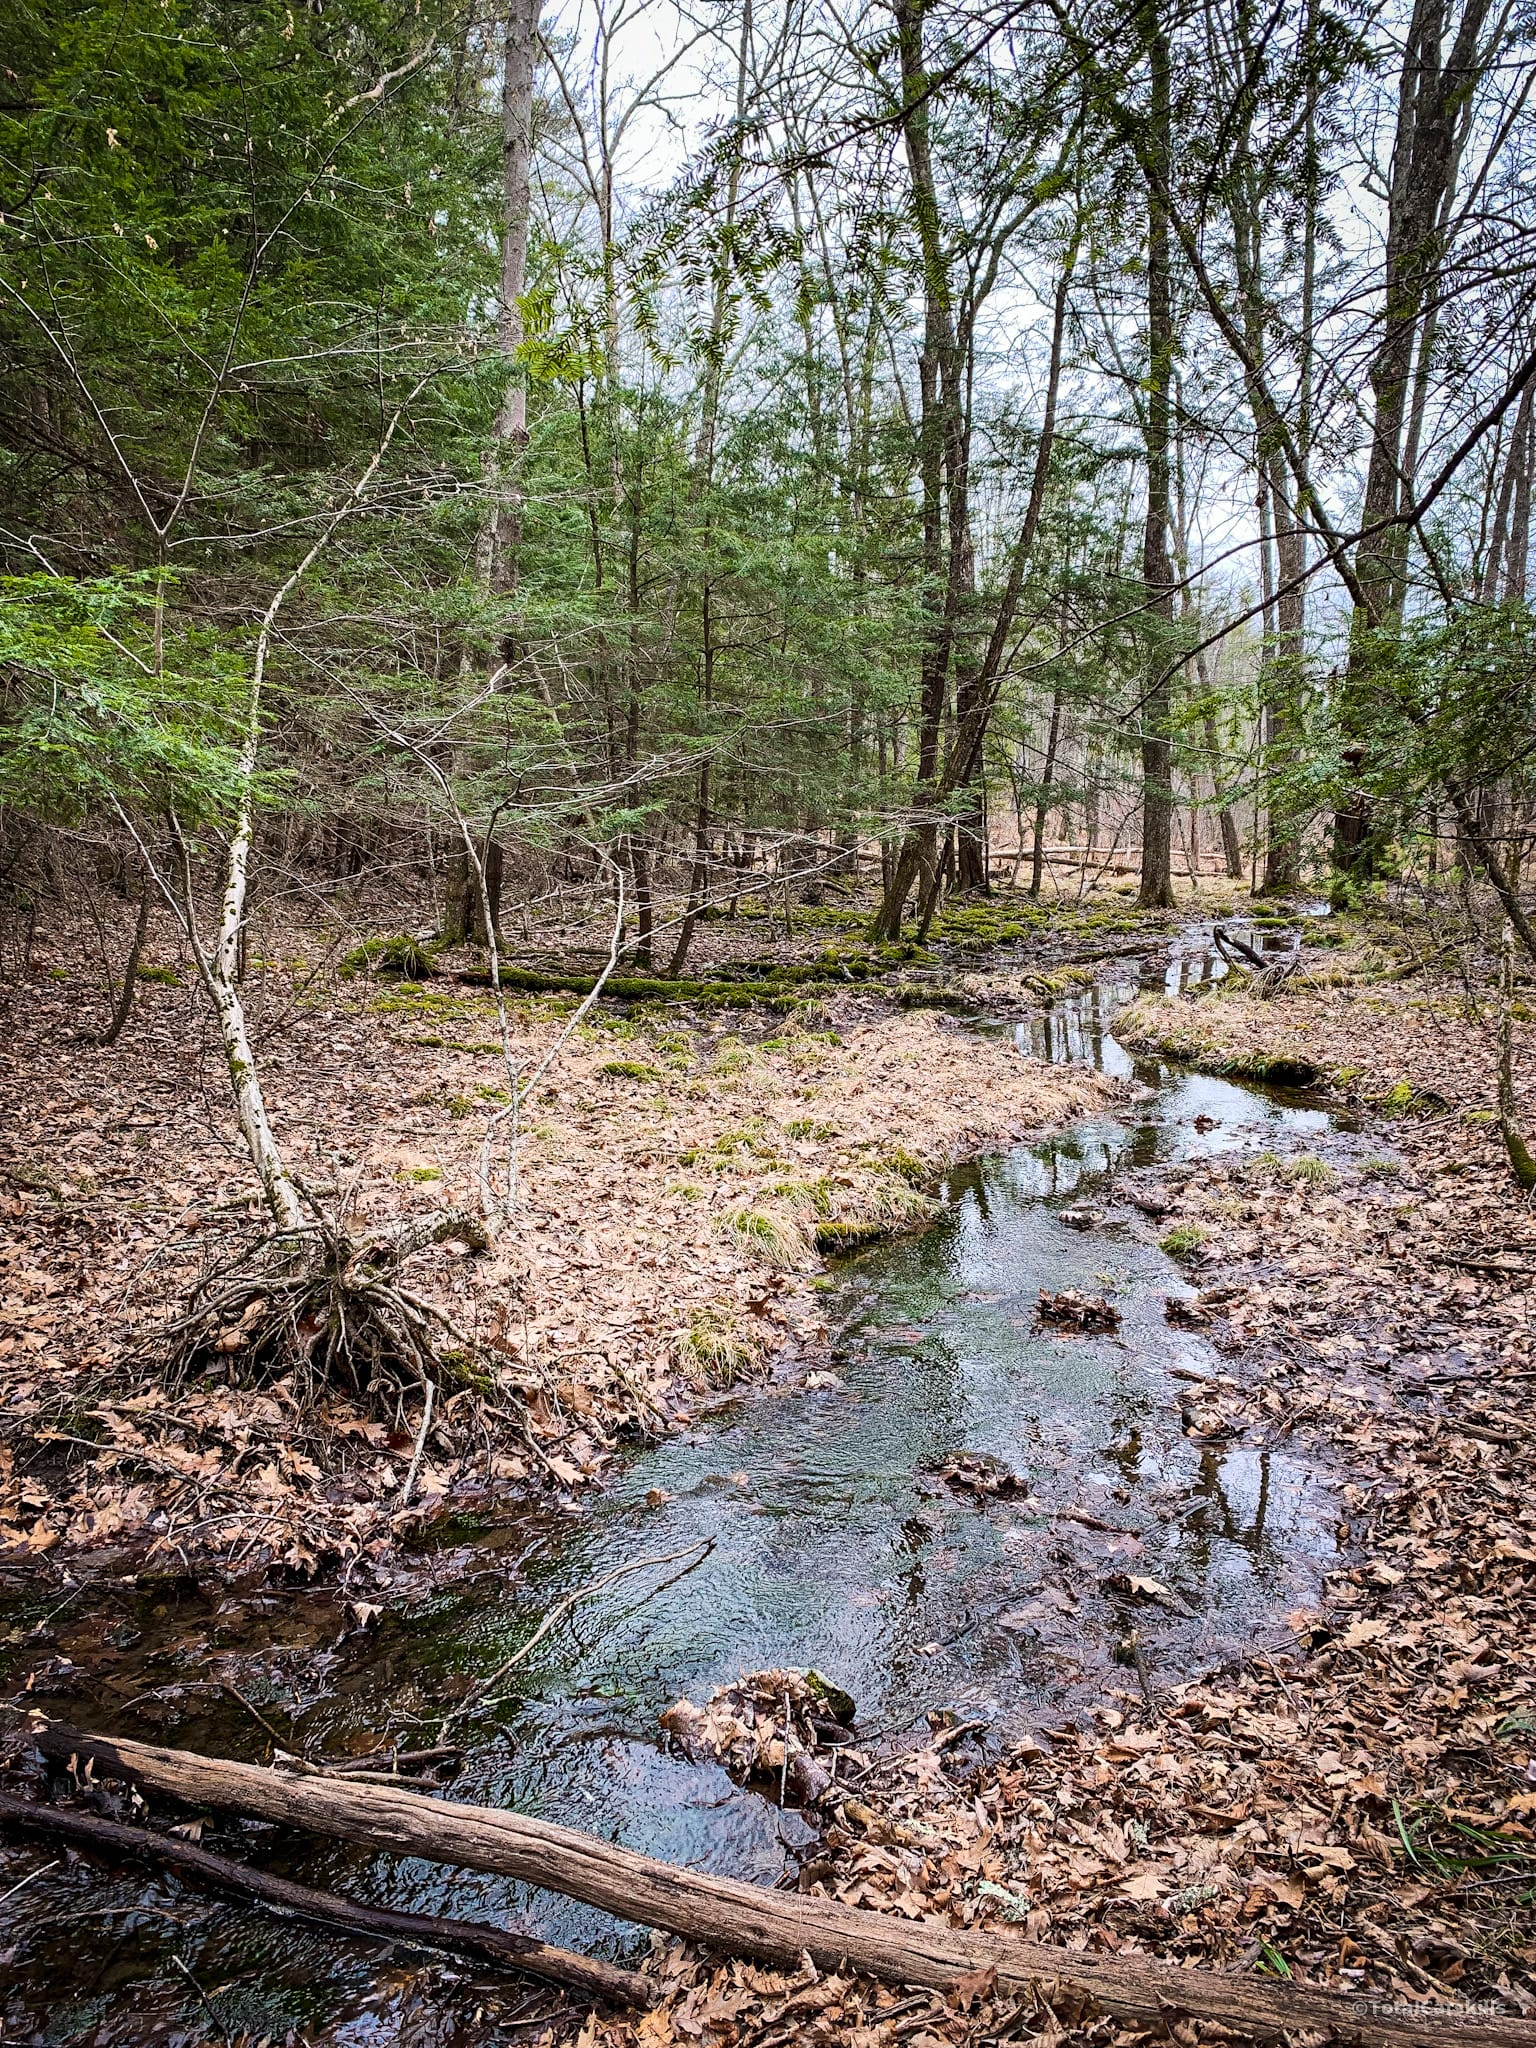 Catskill stream and woods